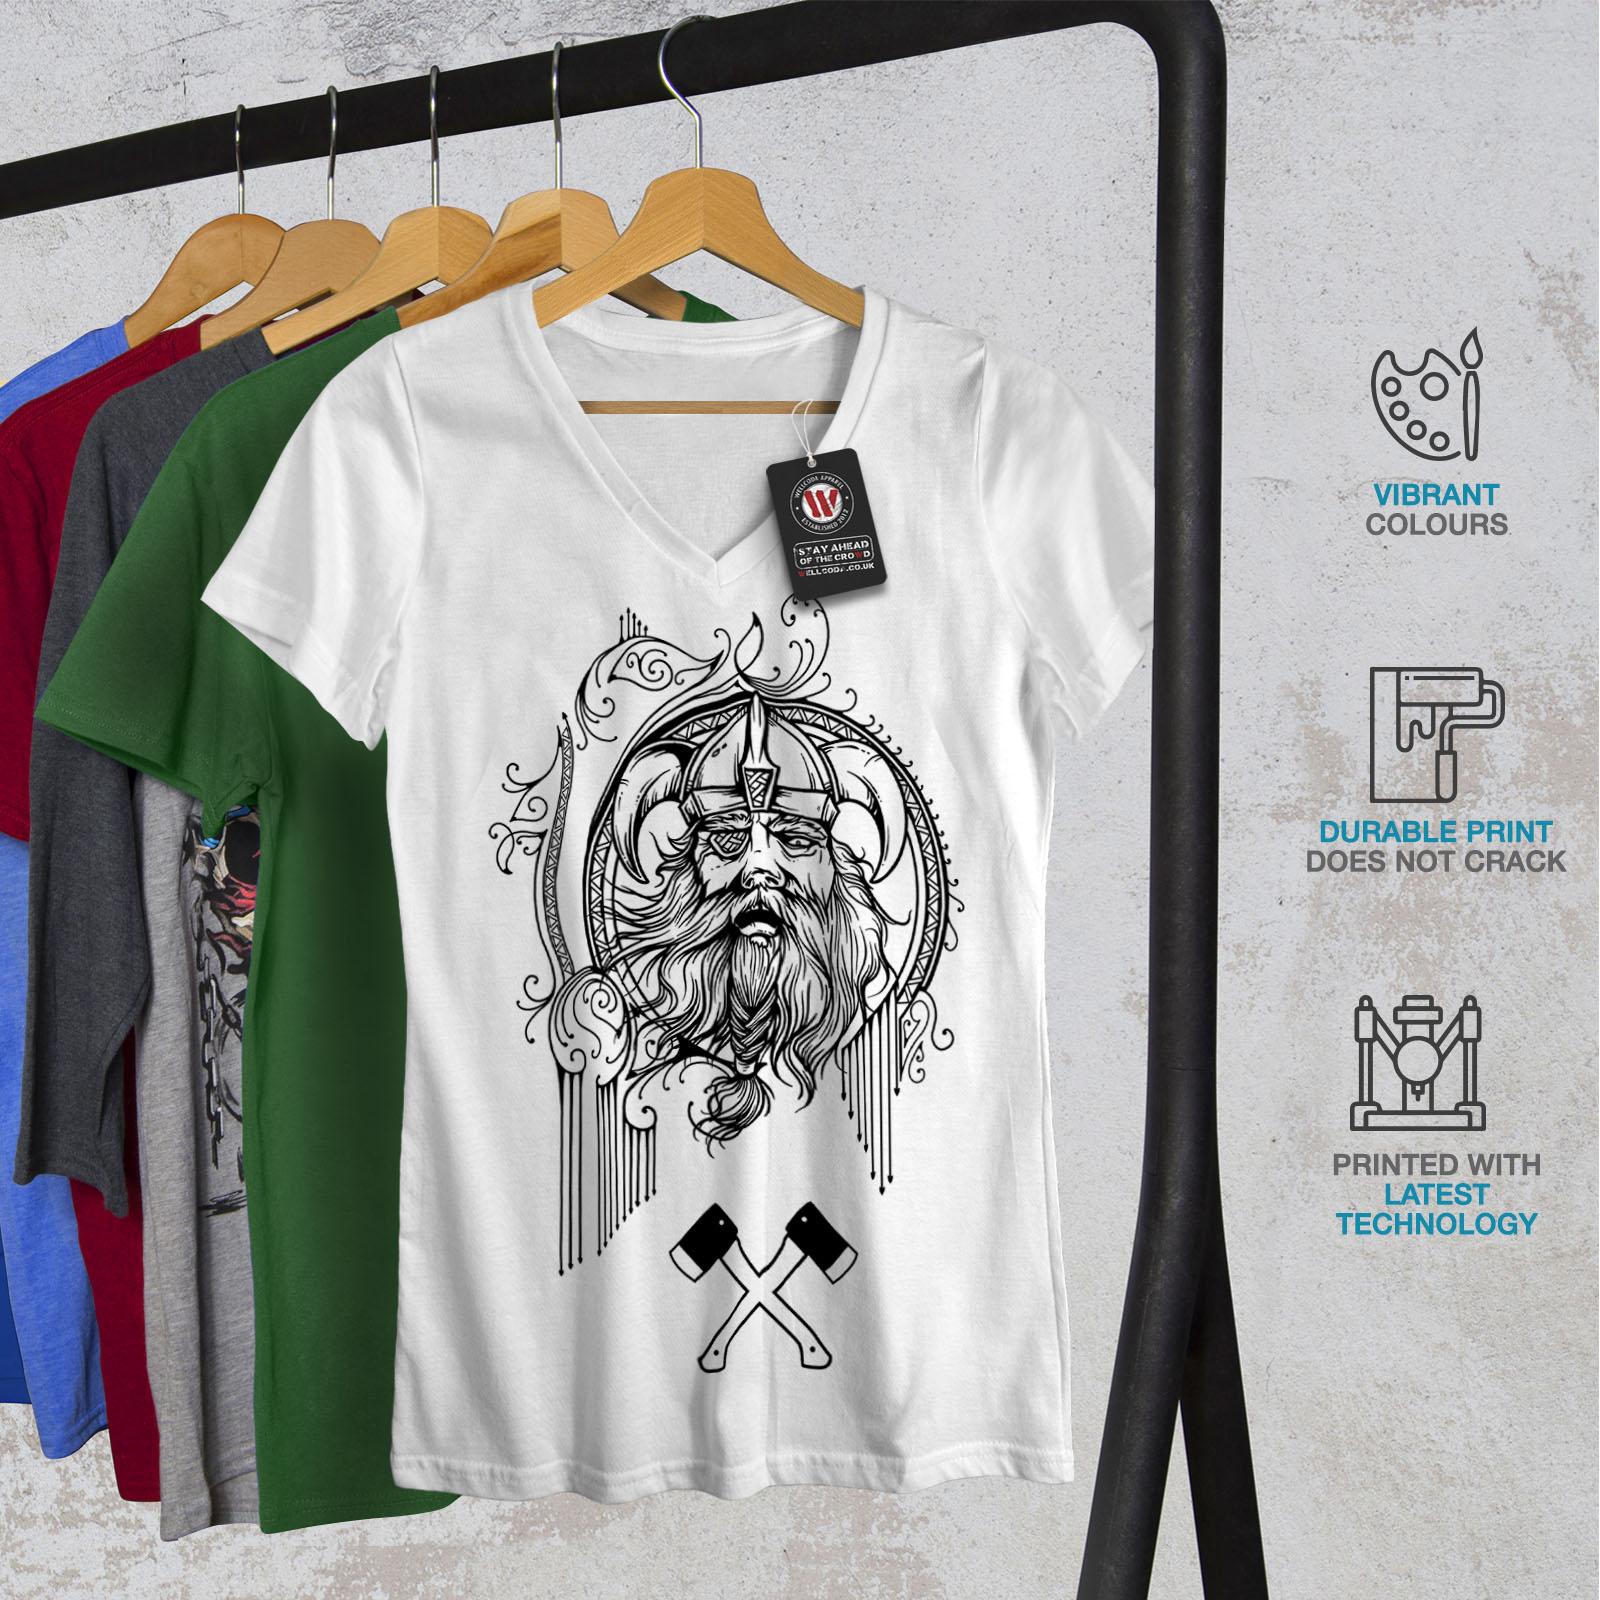 Wellcoda-North-Face-Guerrier-Femme-T-Shirt-col-V-Bataille-de-conception-graphique-Tee miniature 8